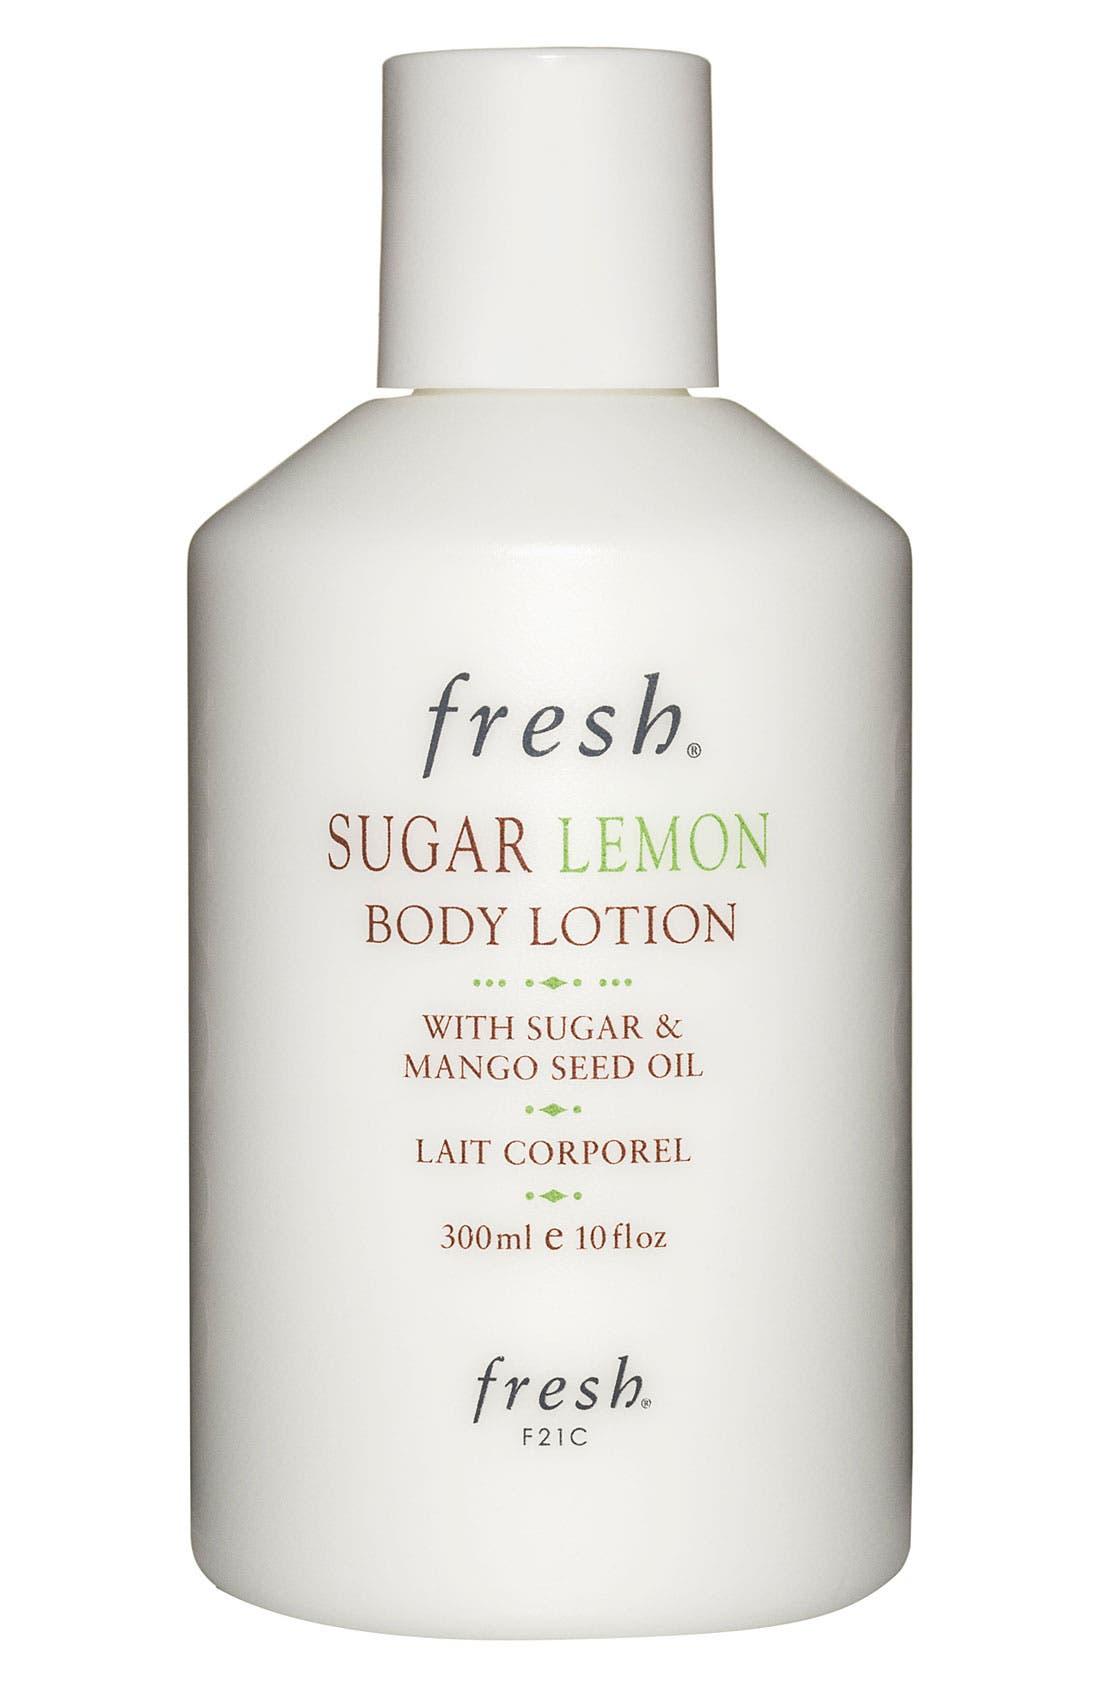 Fresh® Sugar Lemon Body Lotion